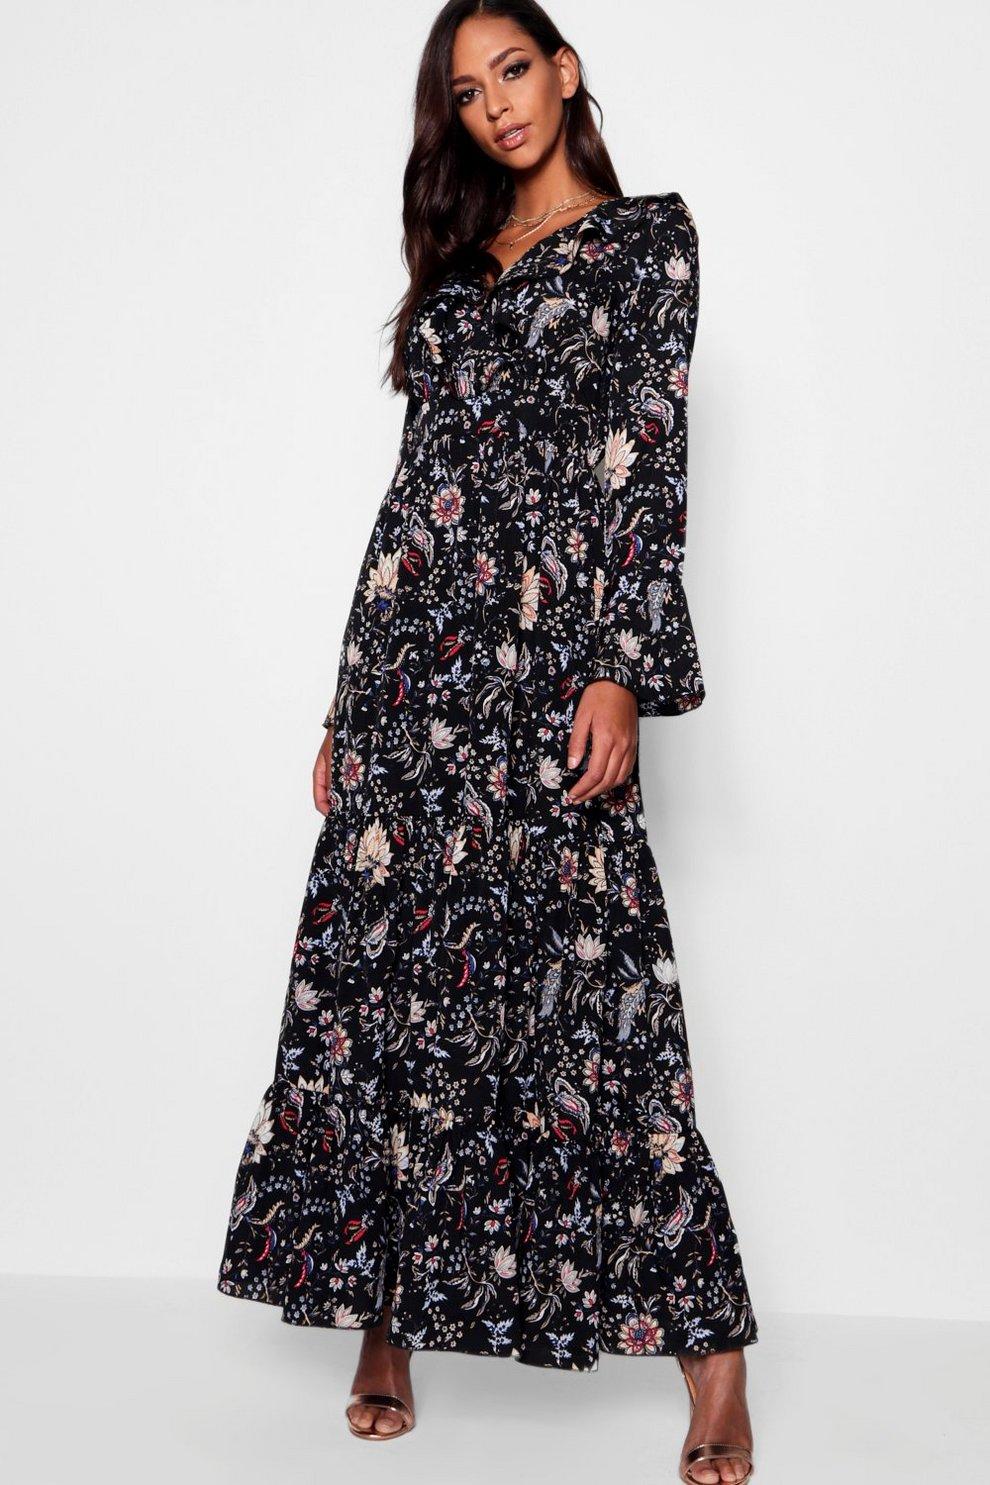 021553e20b01 Ruffle Front Tiered Maxi Dress | Boohoo